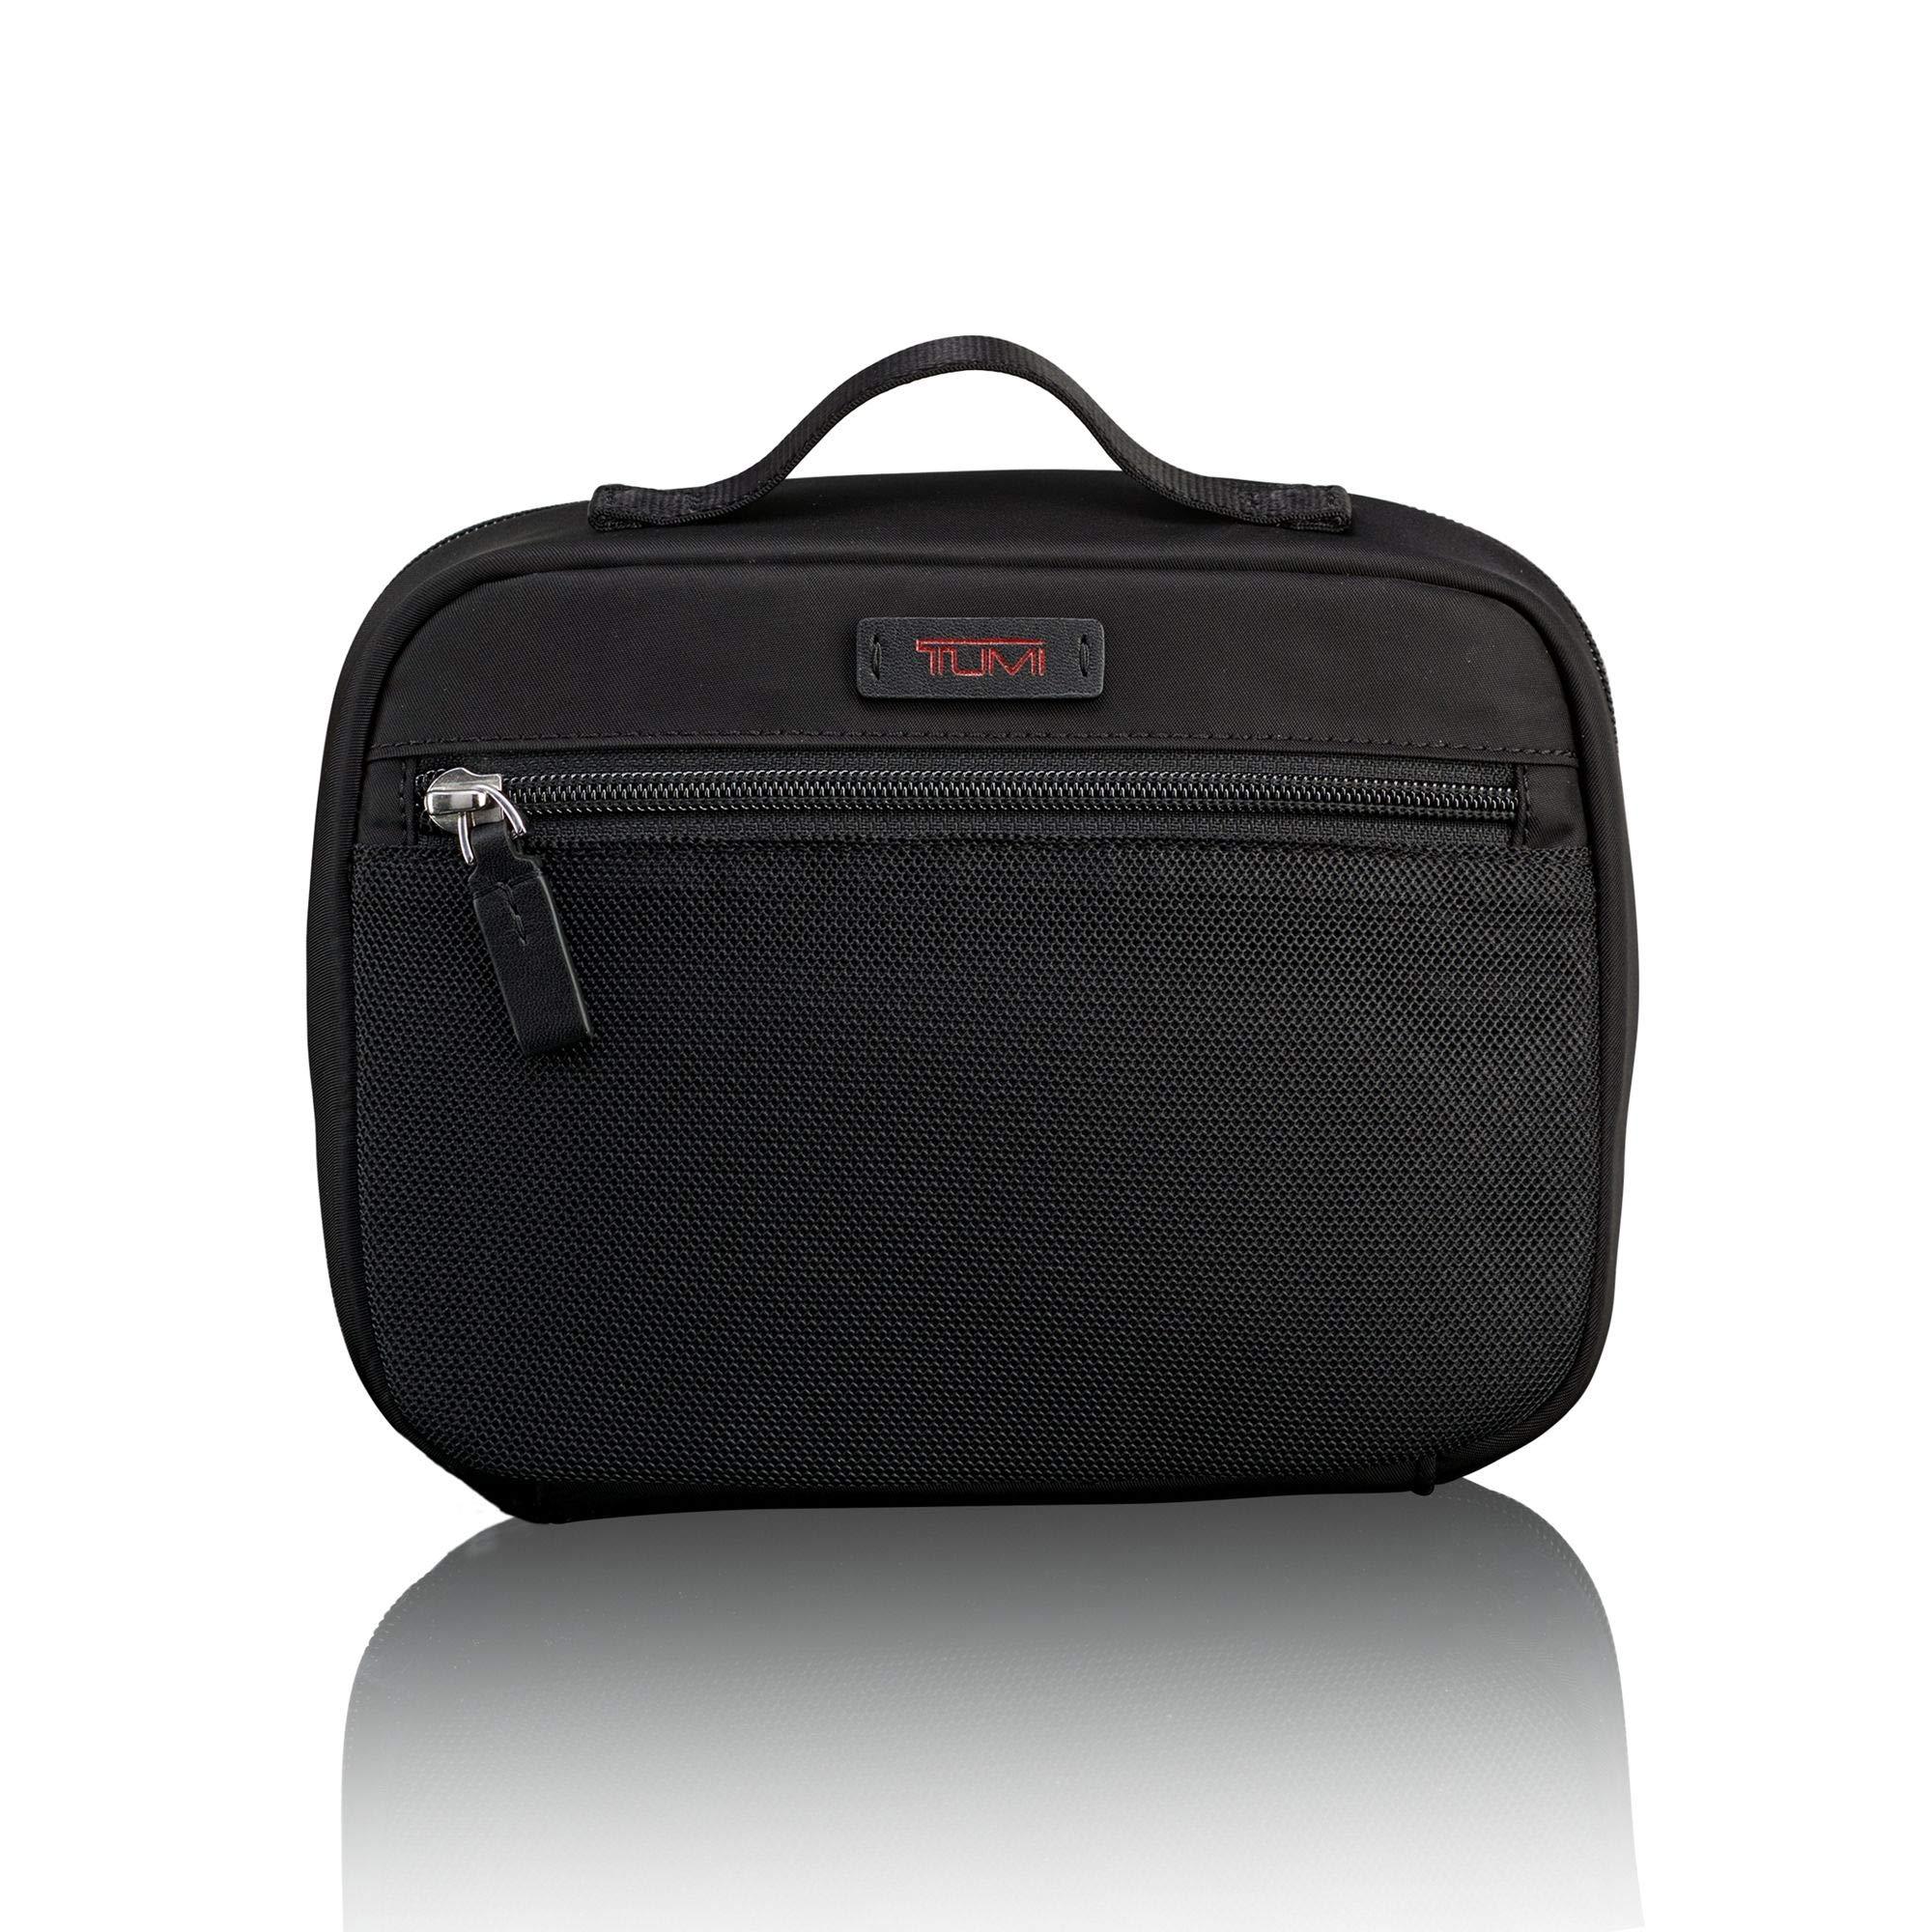 TUMI Accessories Pouch Large, Black